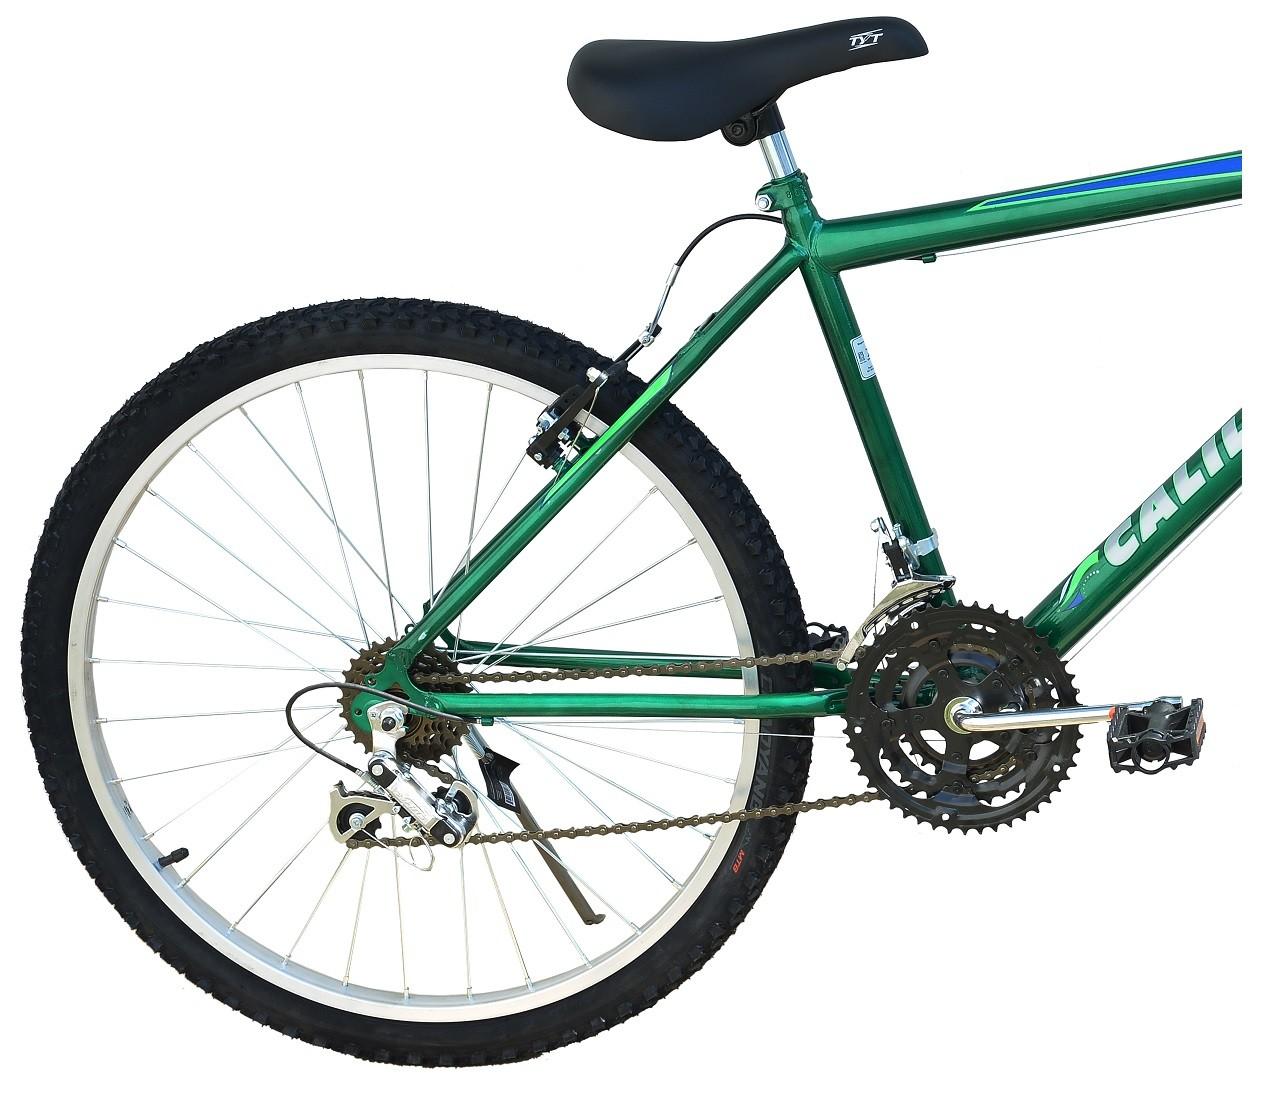 Bicicleta Passeio Calil Bike Aro 26 Com Marcha 21v Verde